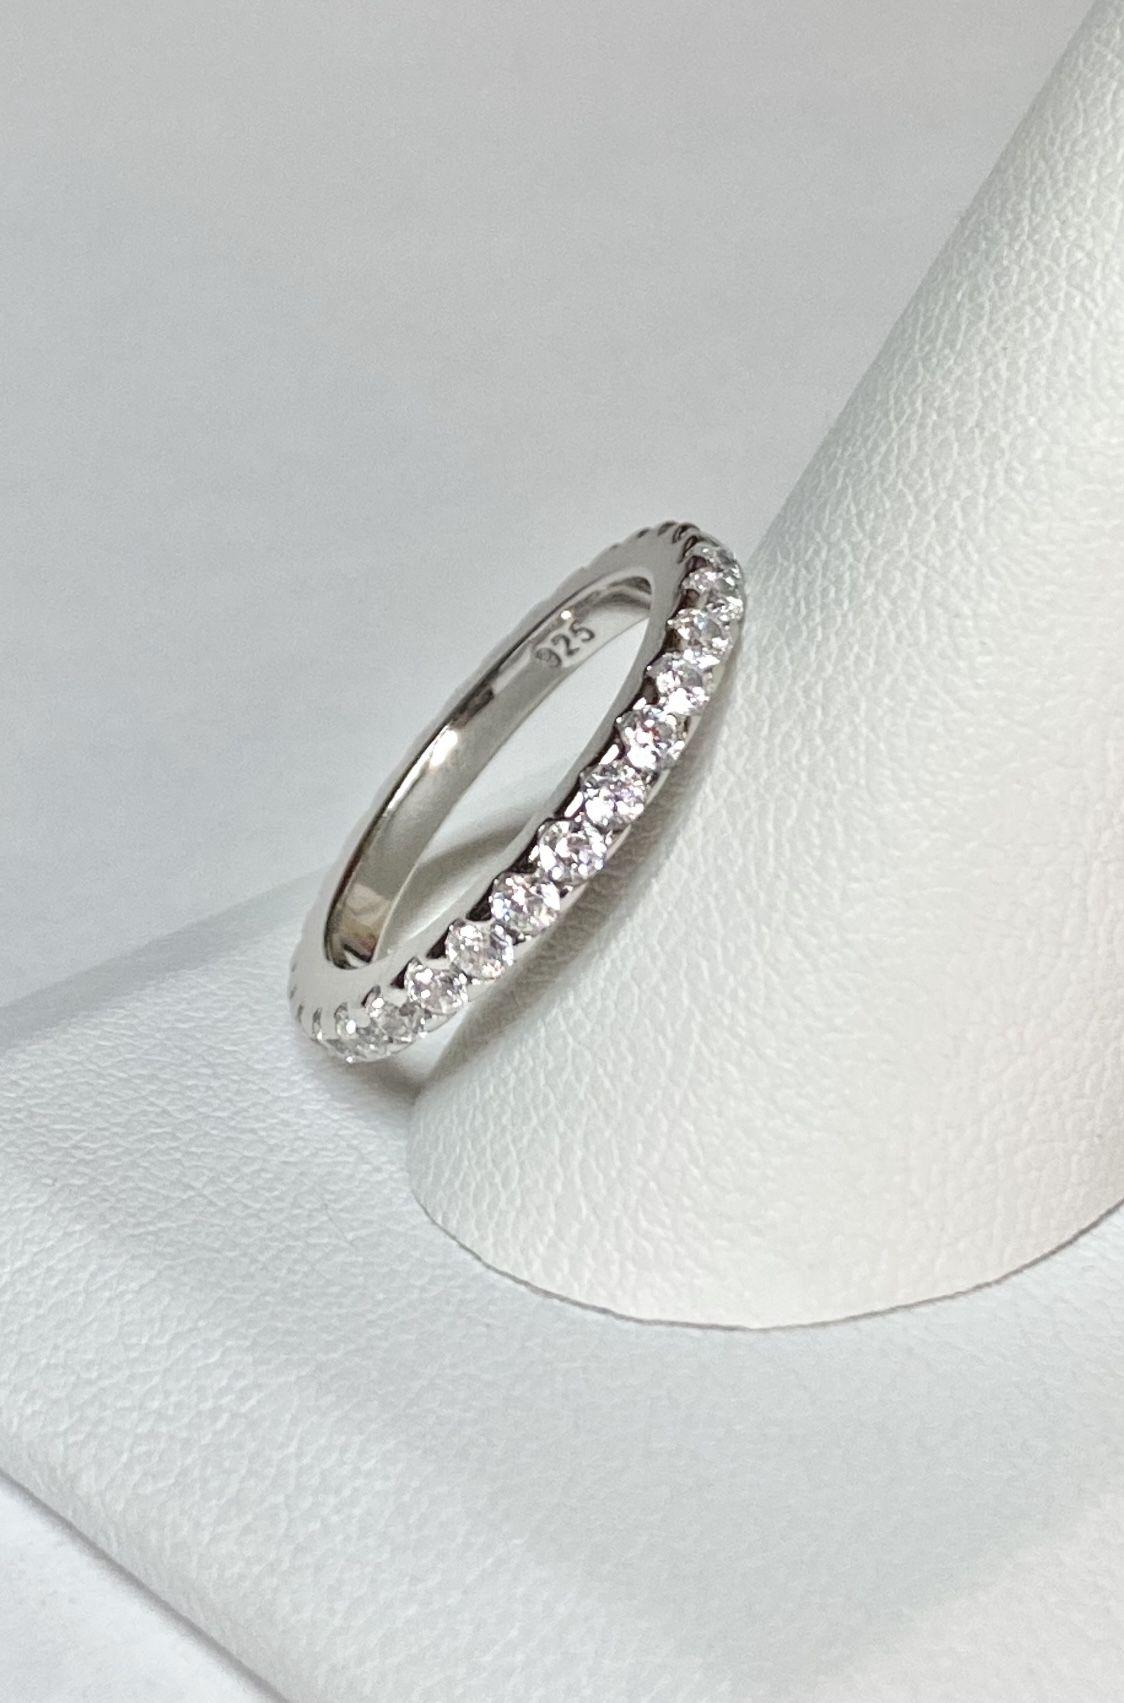 Vintage 14k Yellow Gold .90ct Ruby Diamond Band Wedding Engagement Ring #32450